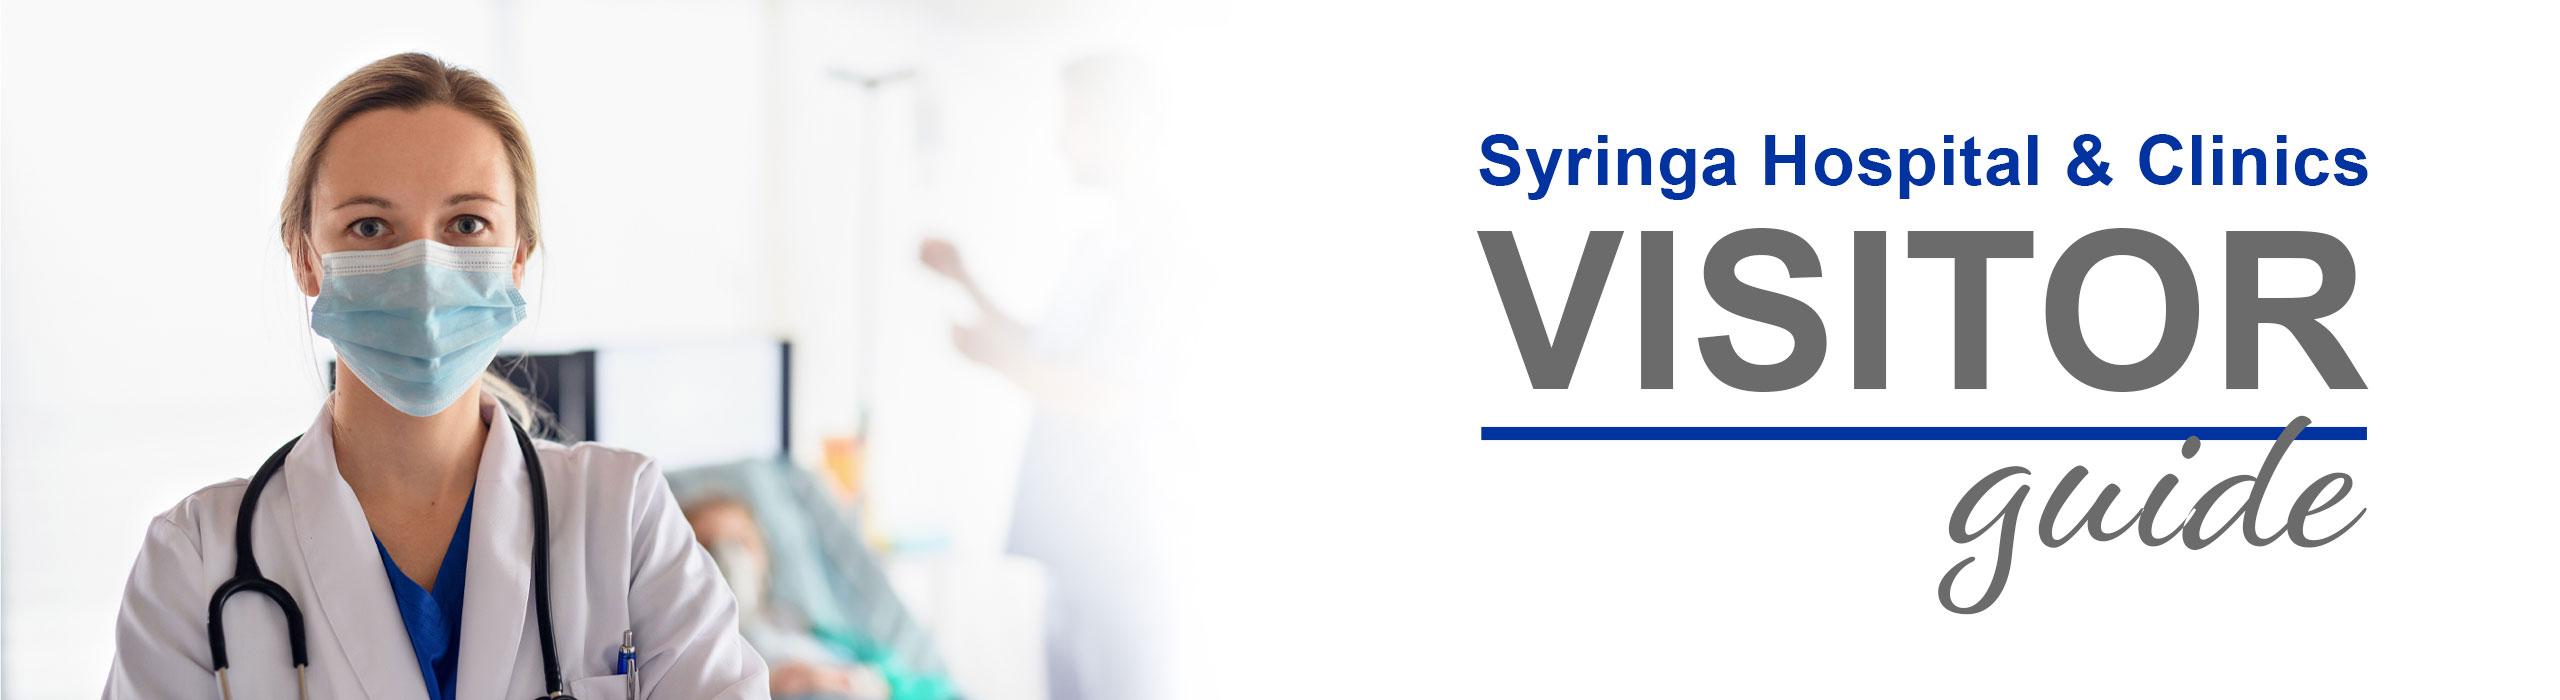 Syringa Hospital & Clinics Visitor Guide